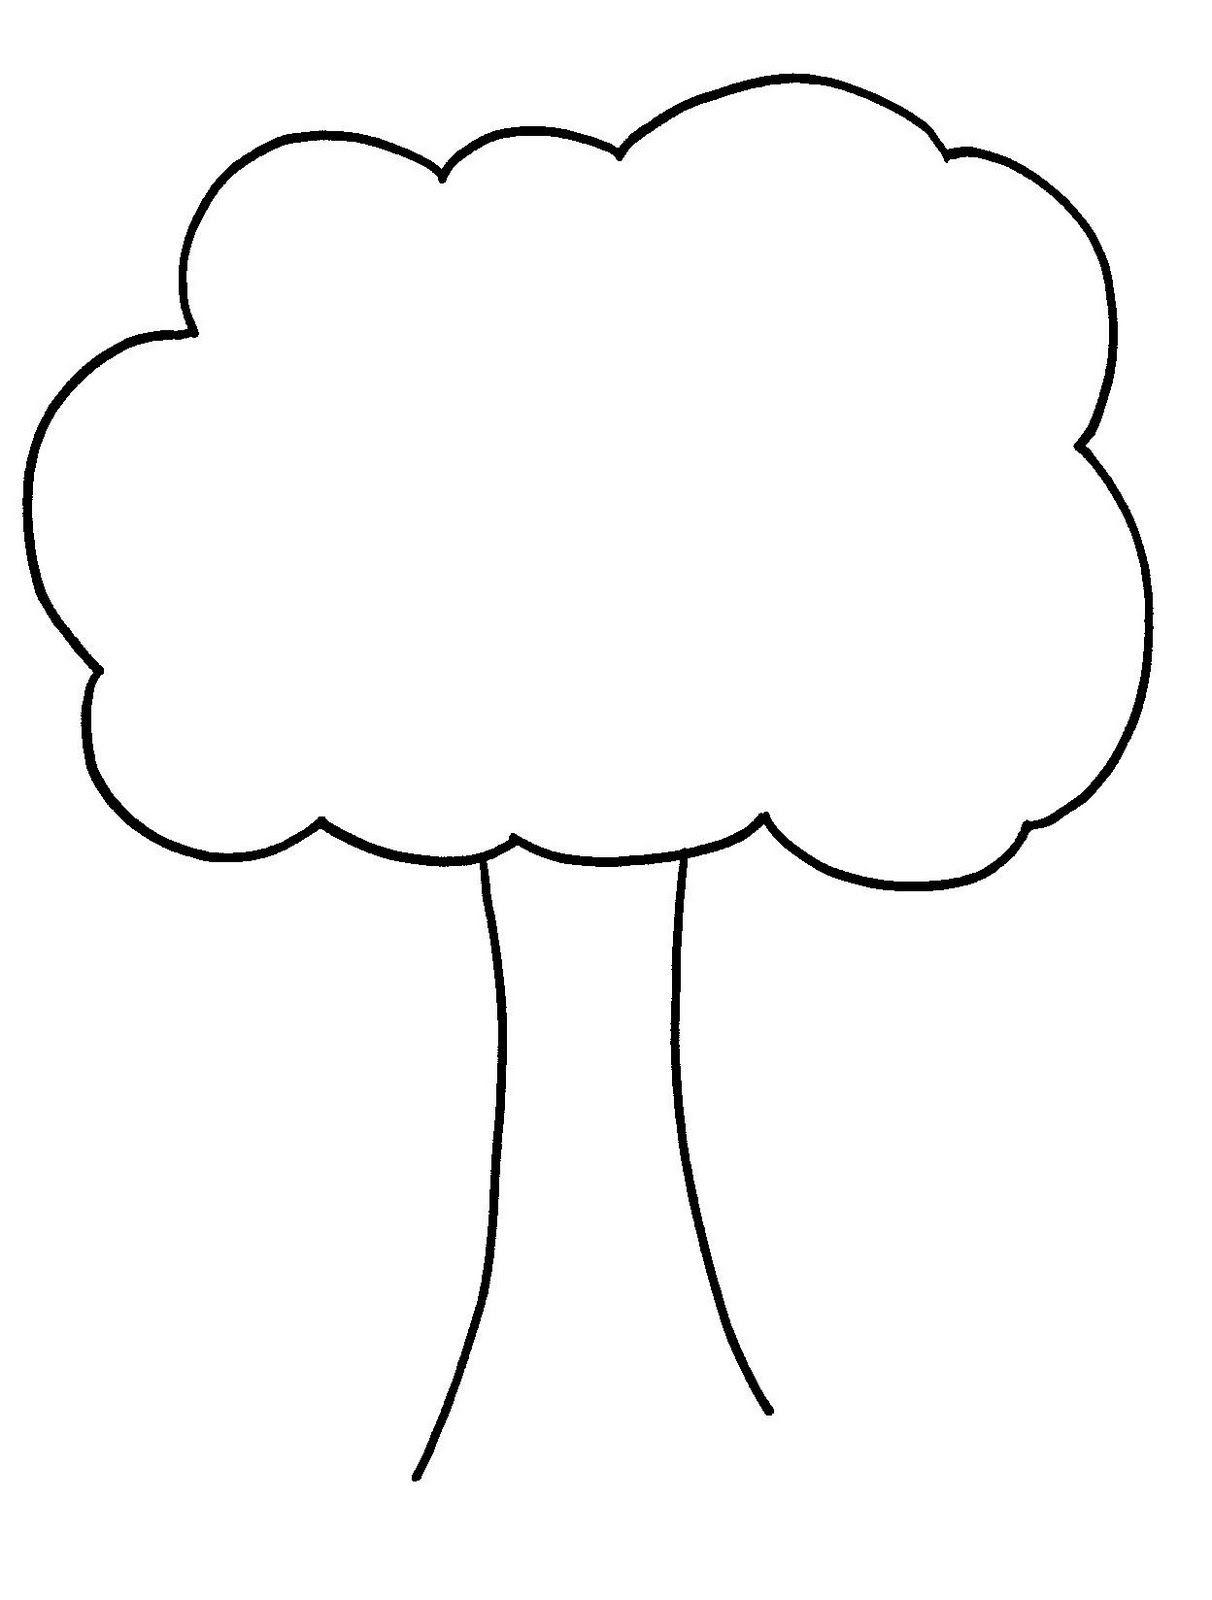 T For Tissue Paper Tree Brilliant Beginnings Preschool T Is For Tissue Paper Trees